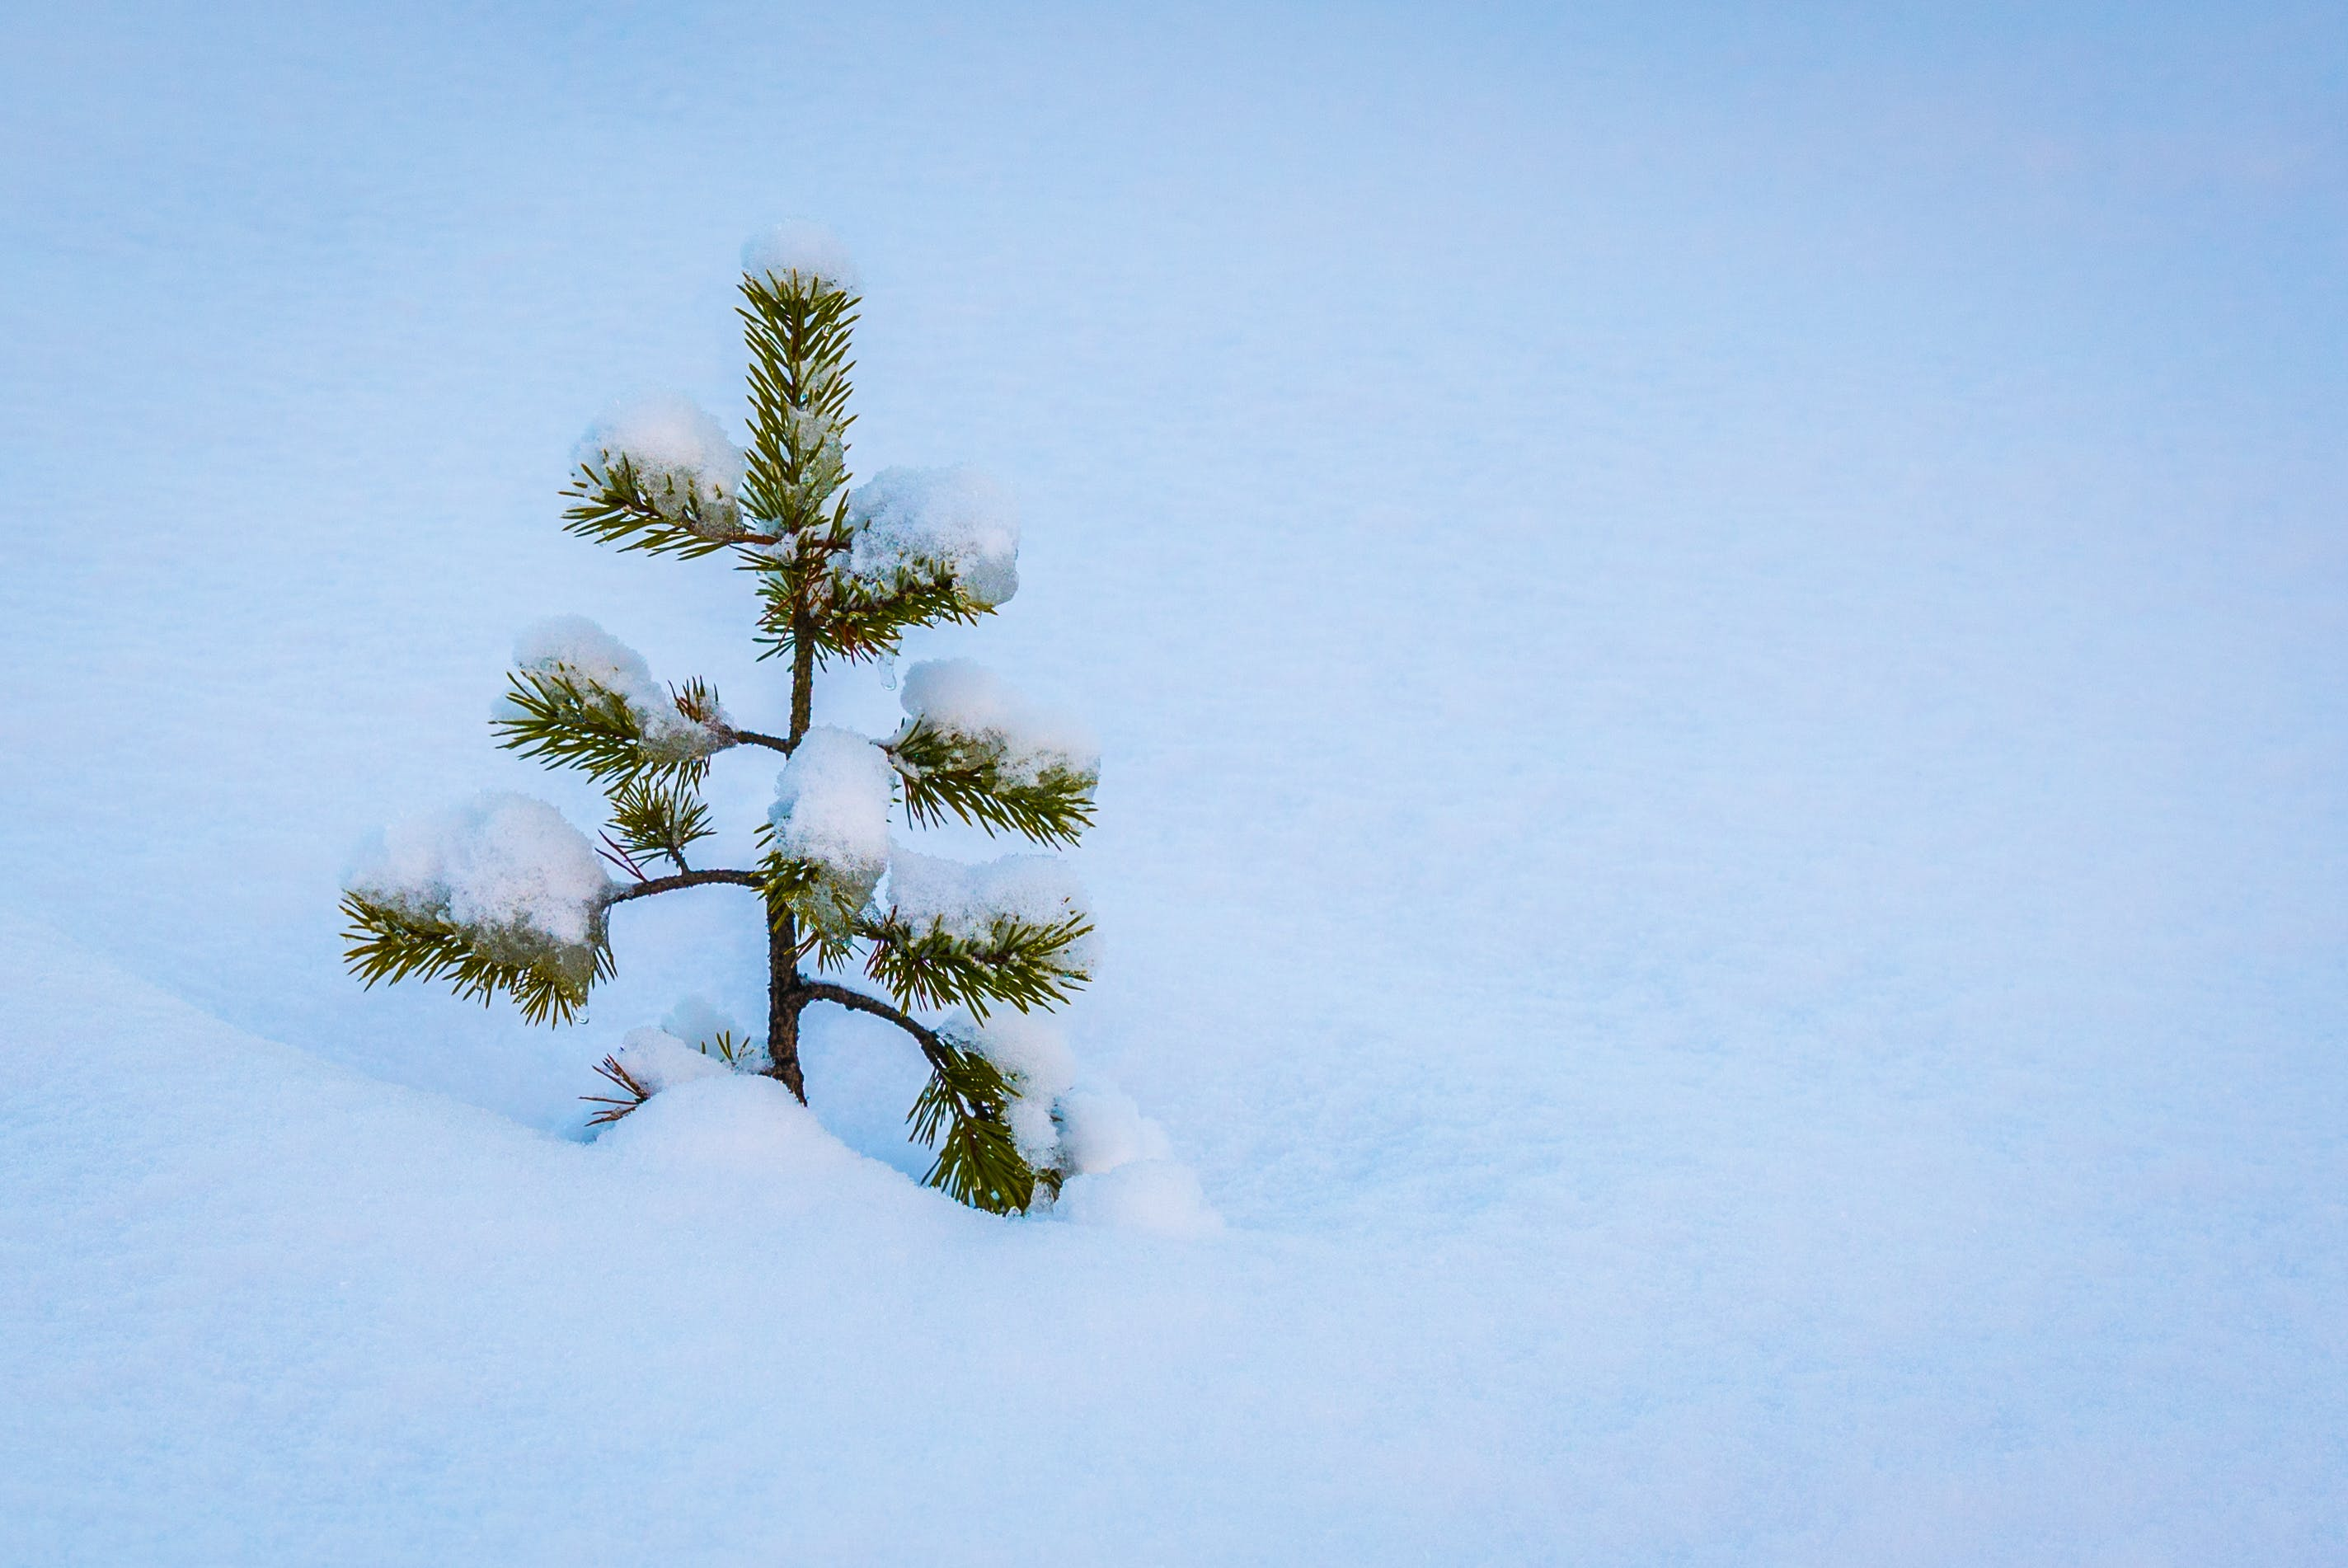 Free stock photo of snow, pine